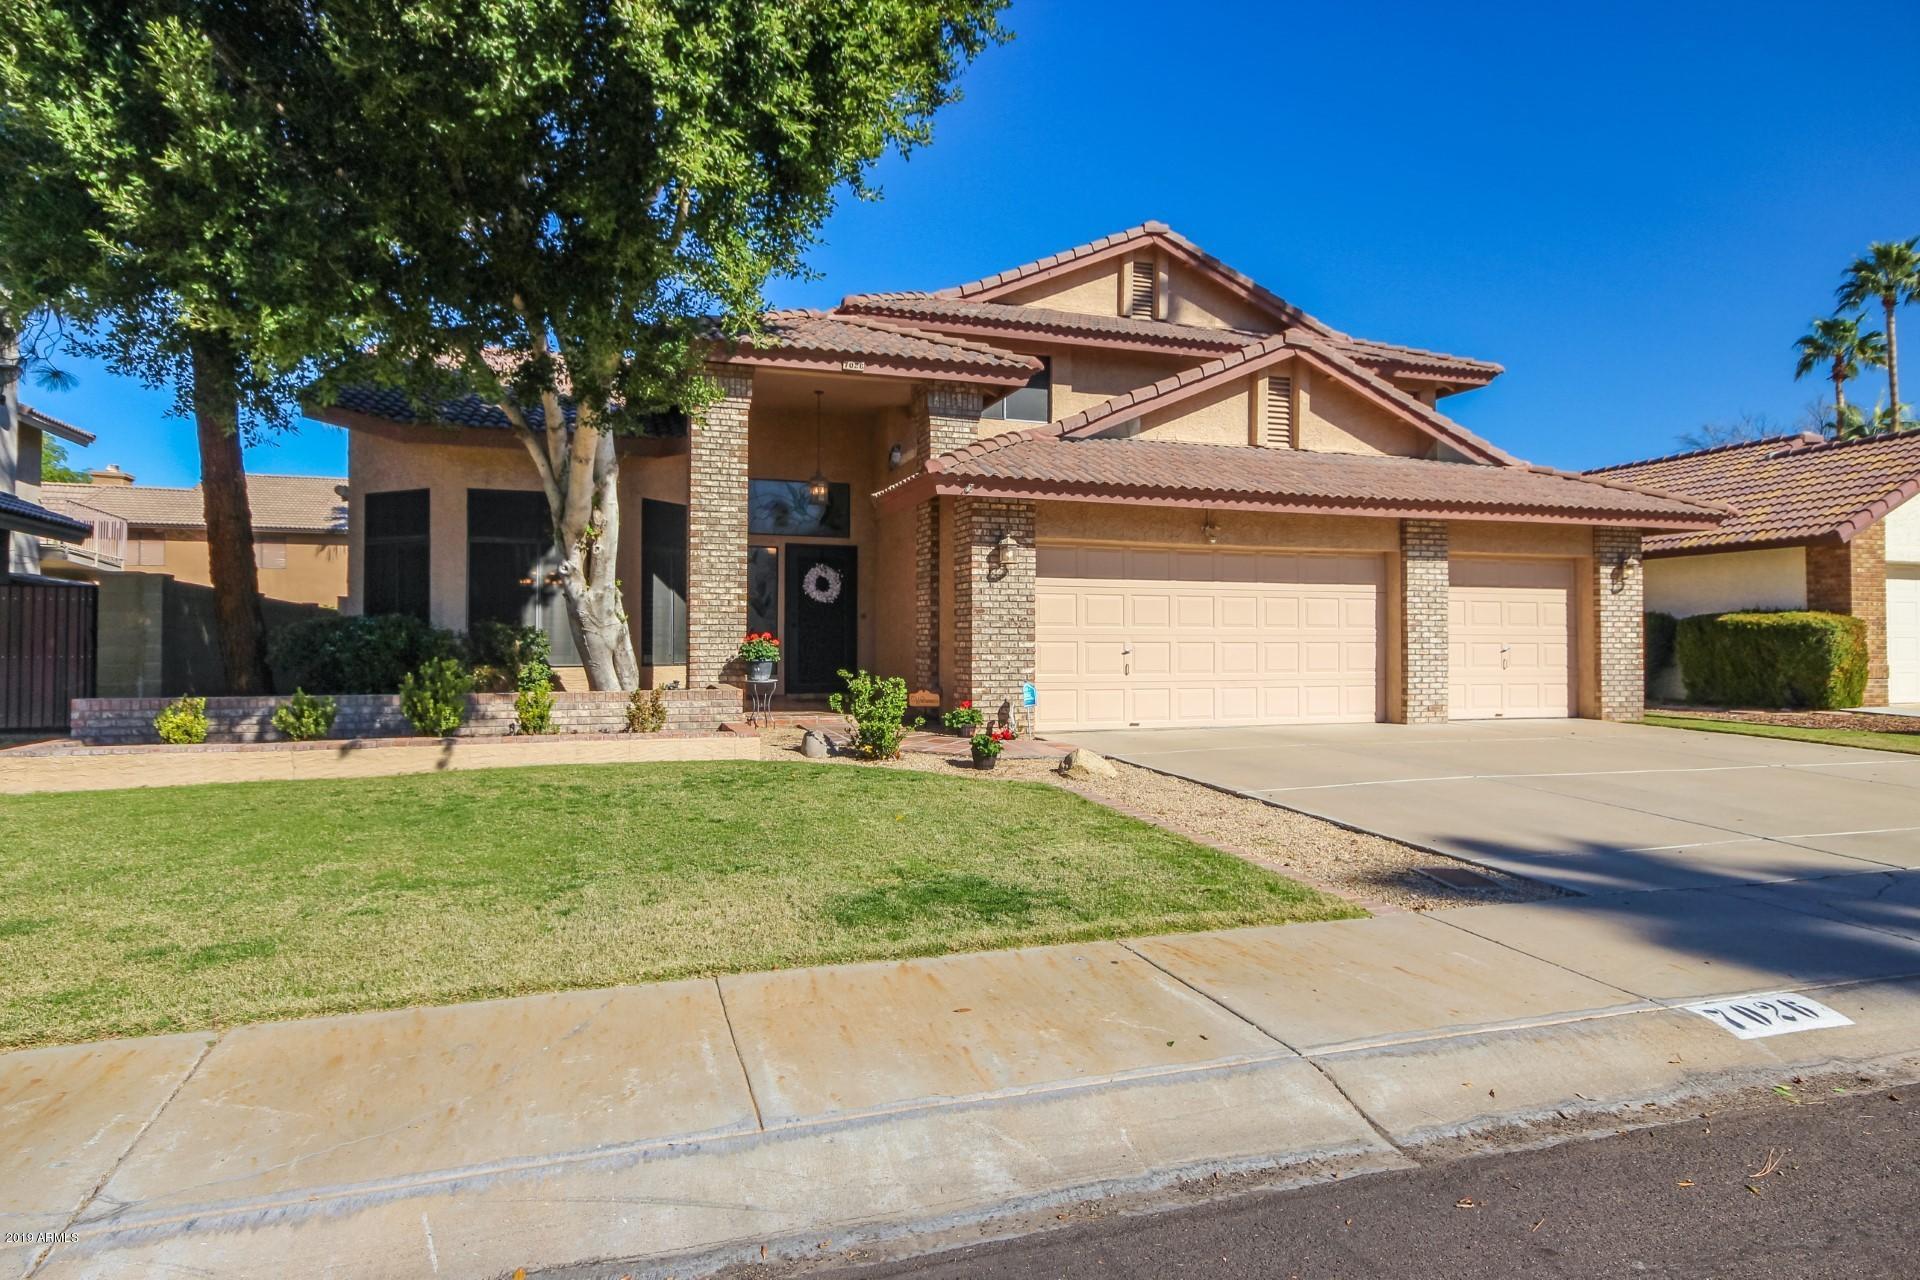 Photo of 7026 W Wescott Drive, Glendale, AZ 85308